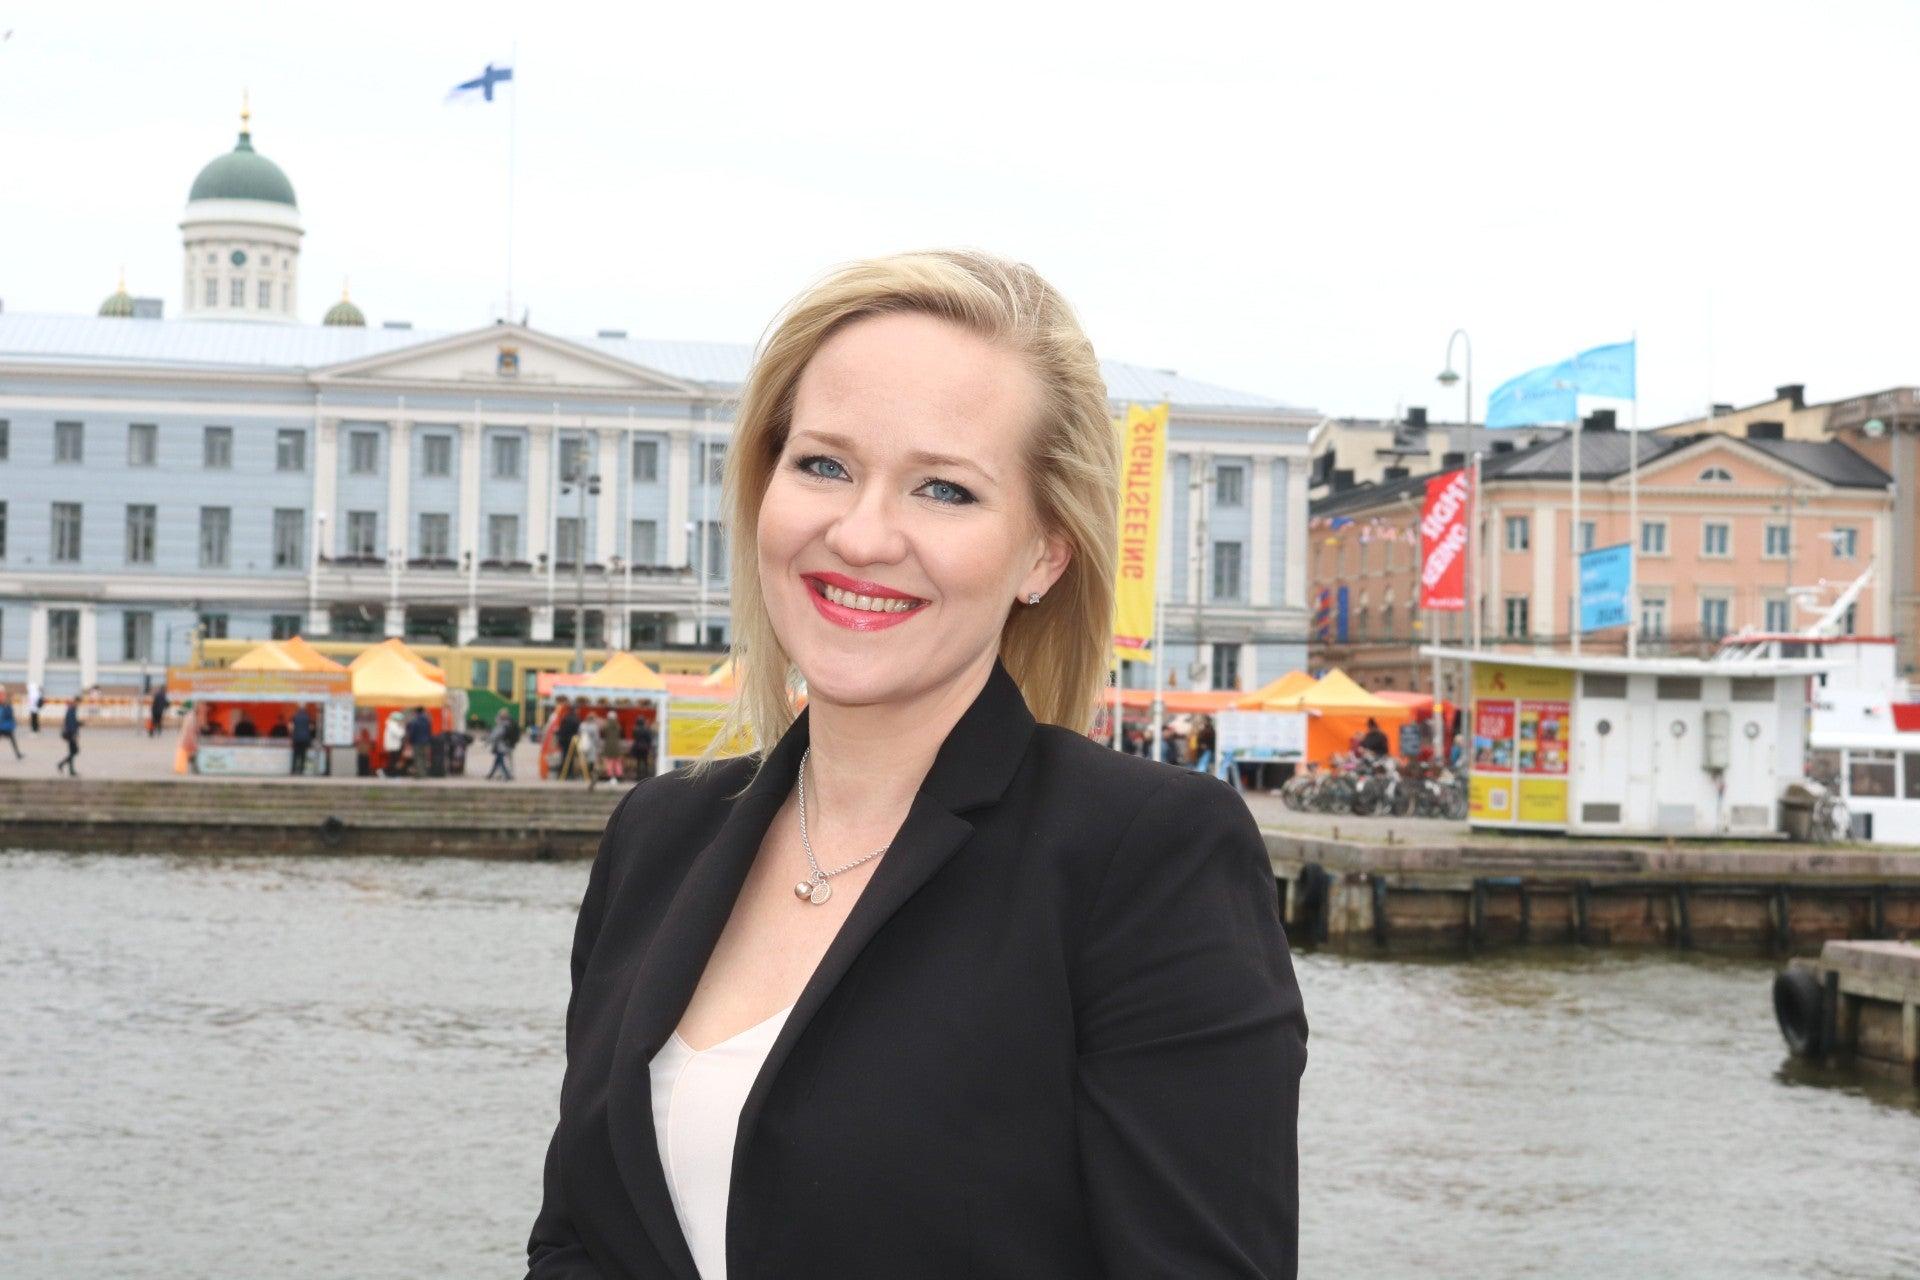 Caratin Senior Client Director Niina Kattelus